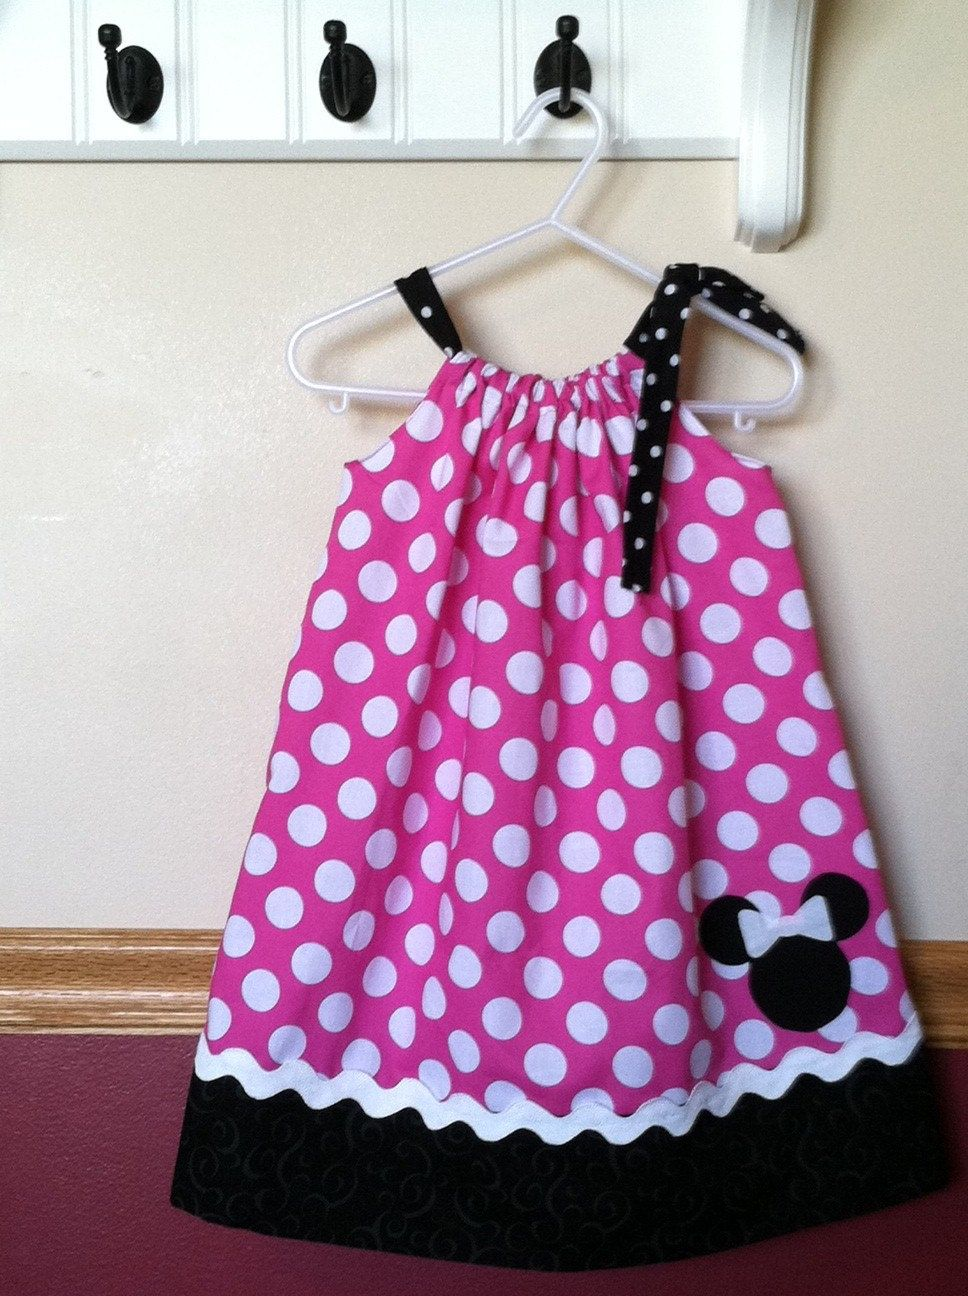 Minnie Mouse Pillowcase dress & Minnie Mouse Pillowcase dress   Grandkids   Pinterest   Minnie ... pillowsntoast.com